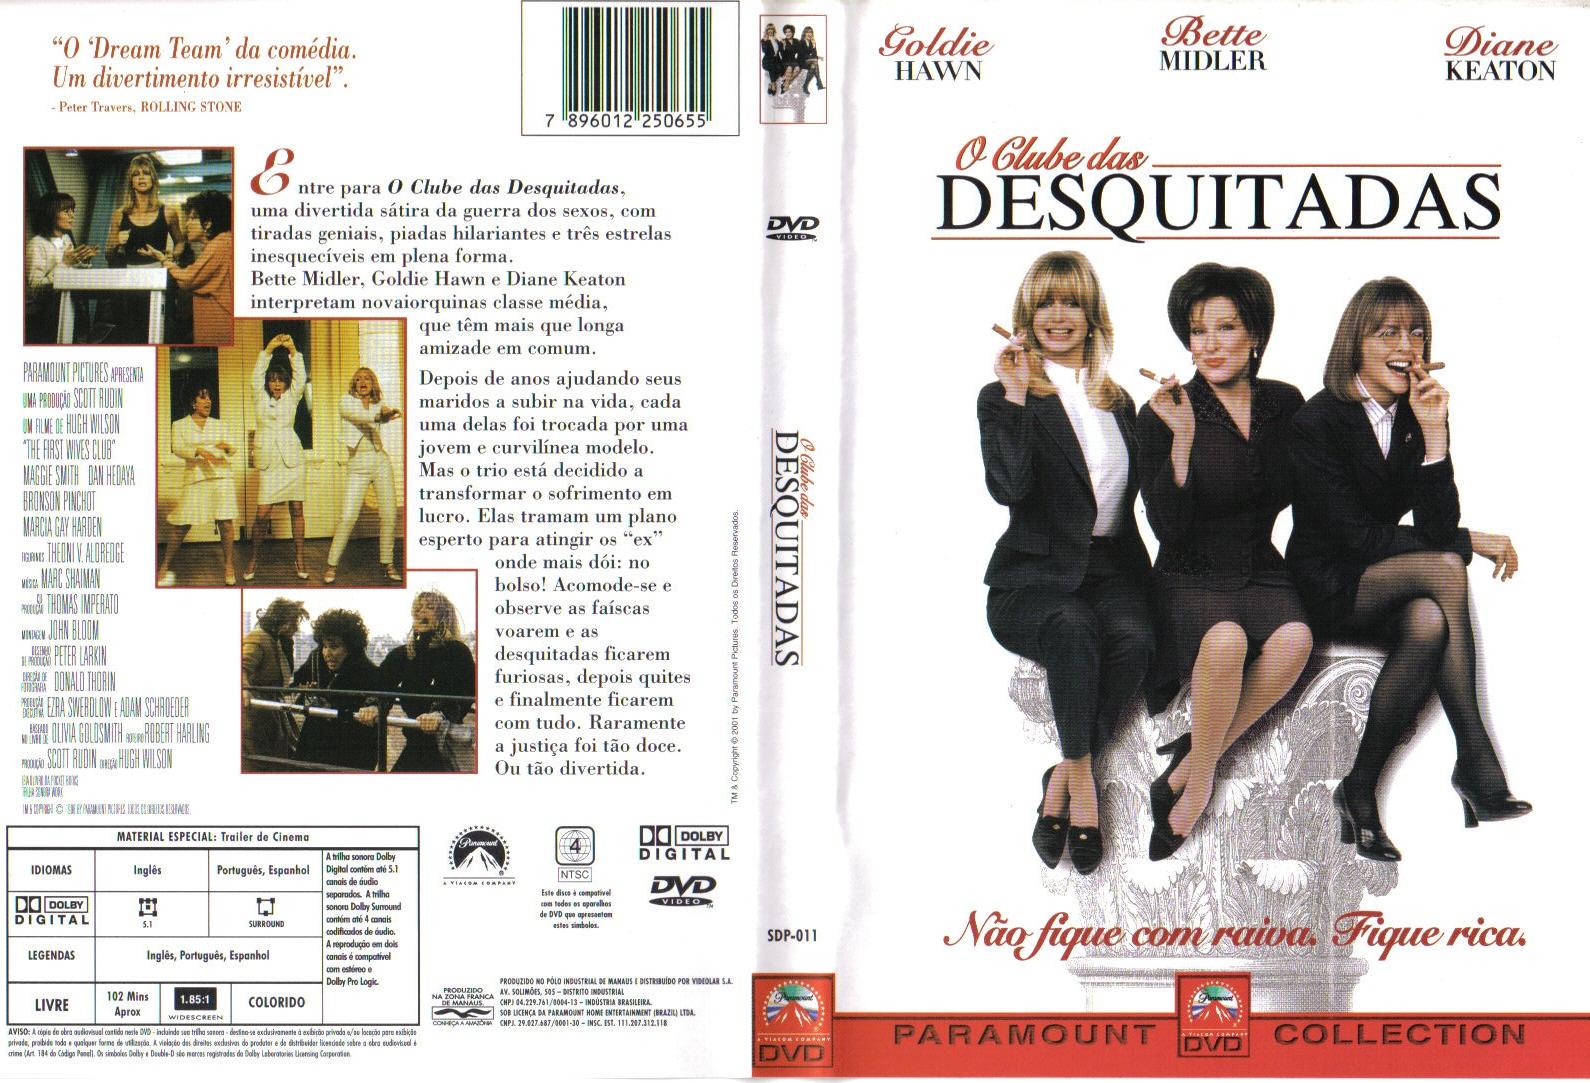 http://4.bp.blogspot.com/-M823ijCZVaI/Td_dNMe1gjI/AAAAAAAAAZo/ckEx6OTinYA/s1600/O_Clube_das_Desquitadas-dvd.jpg